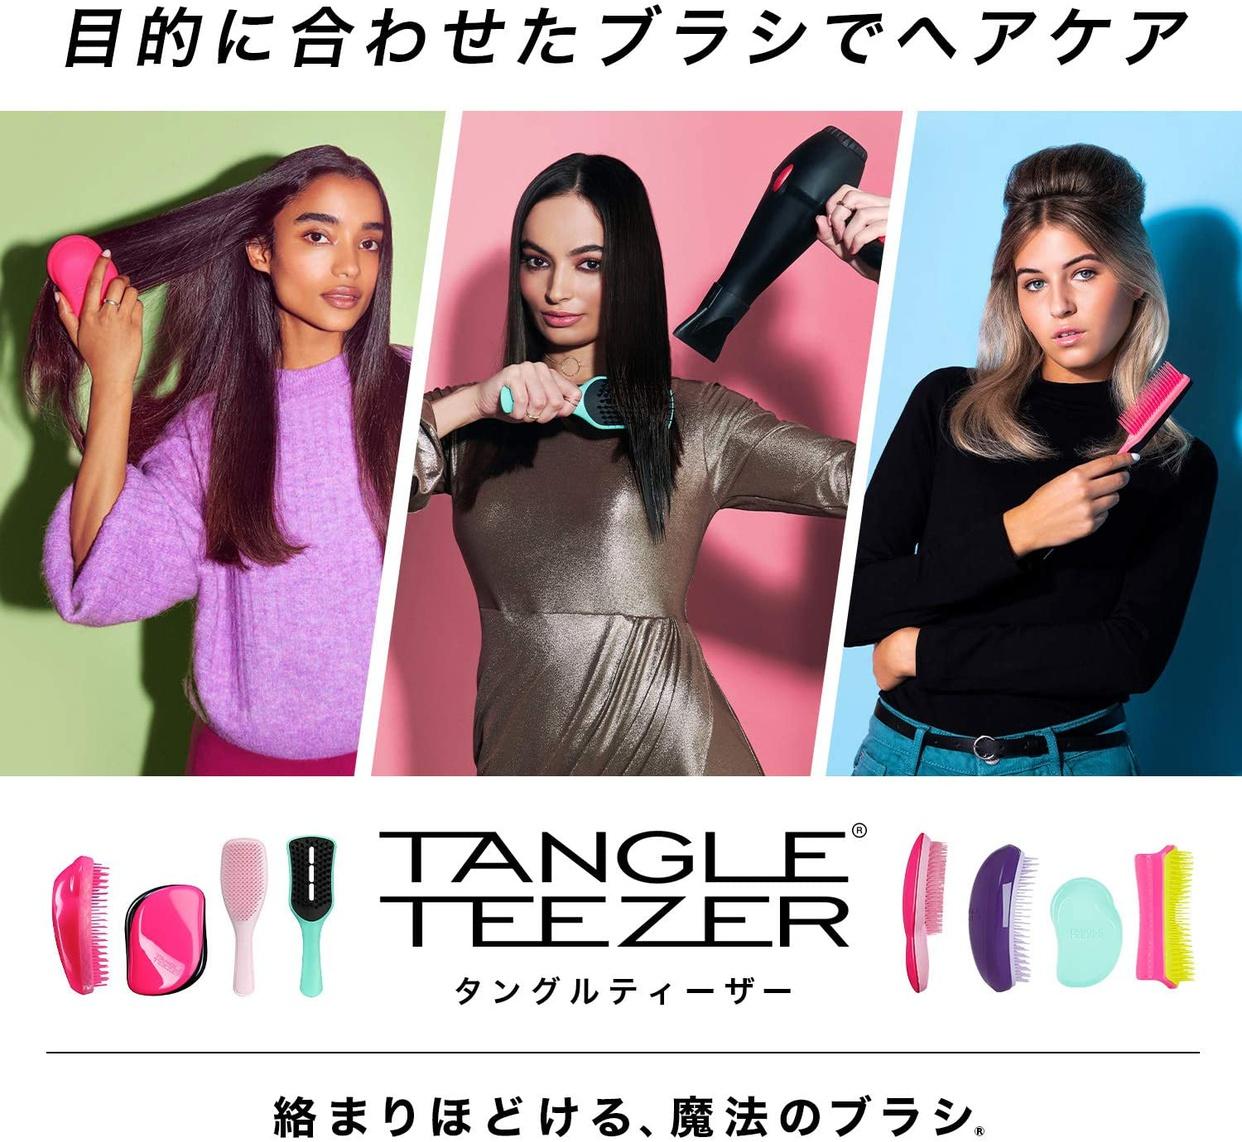 TANGLETEEZER(タングルティーザー) コンパクト スタイラーの商品画像8